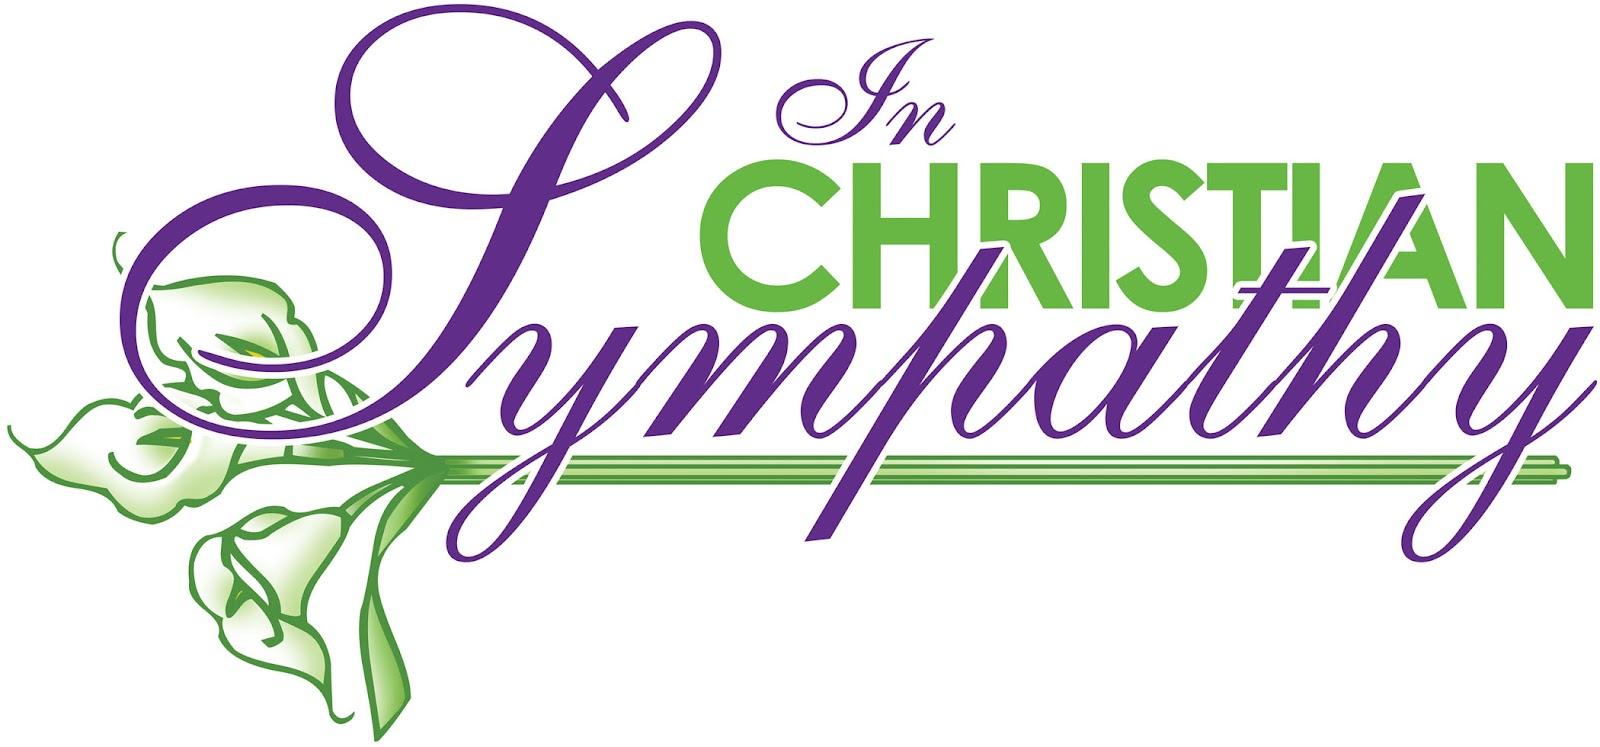 Free Christian Sympathy Clip Art free image.